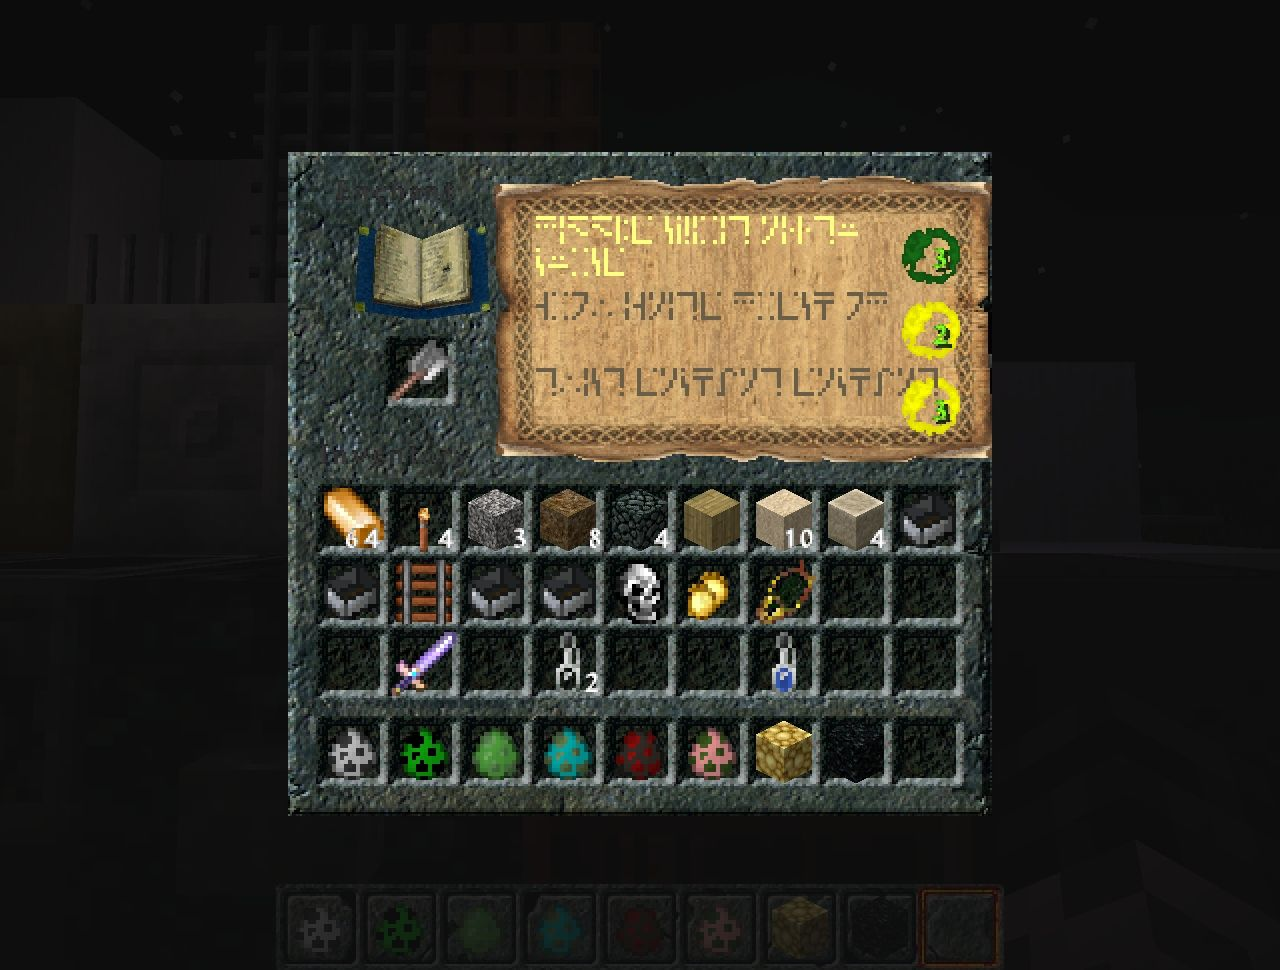 http://planetaminecraft.com/wp-content/uploads/2013/09/d5e0c__Baldurs-craft-pack-6.jpg